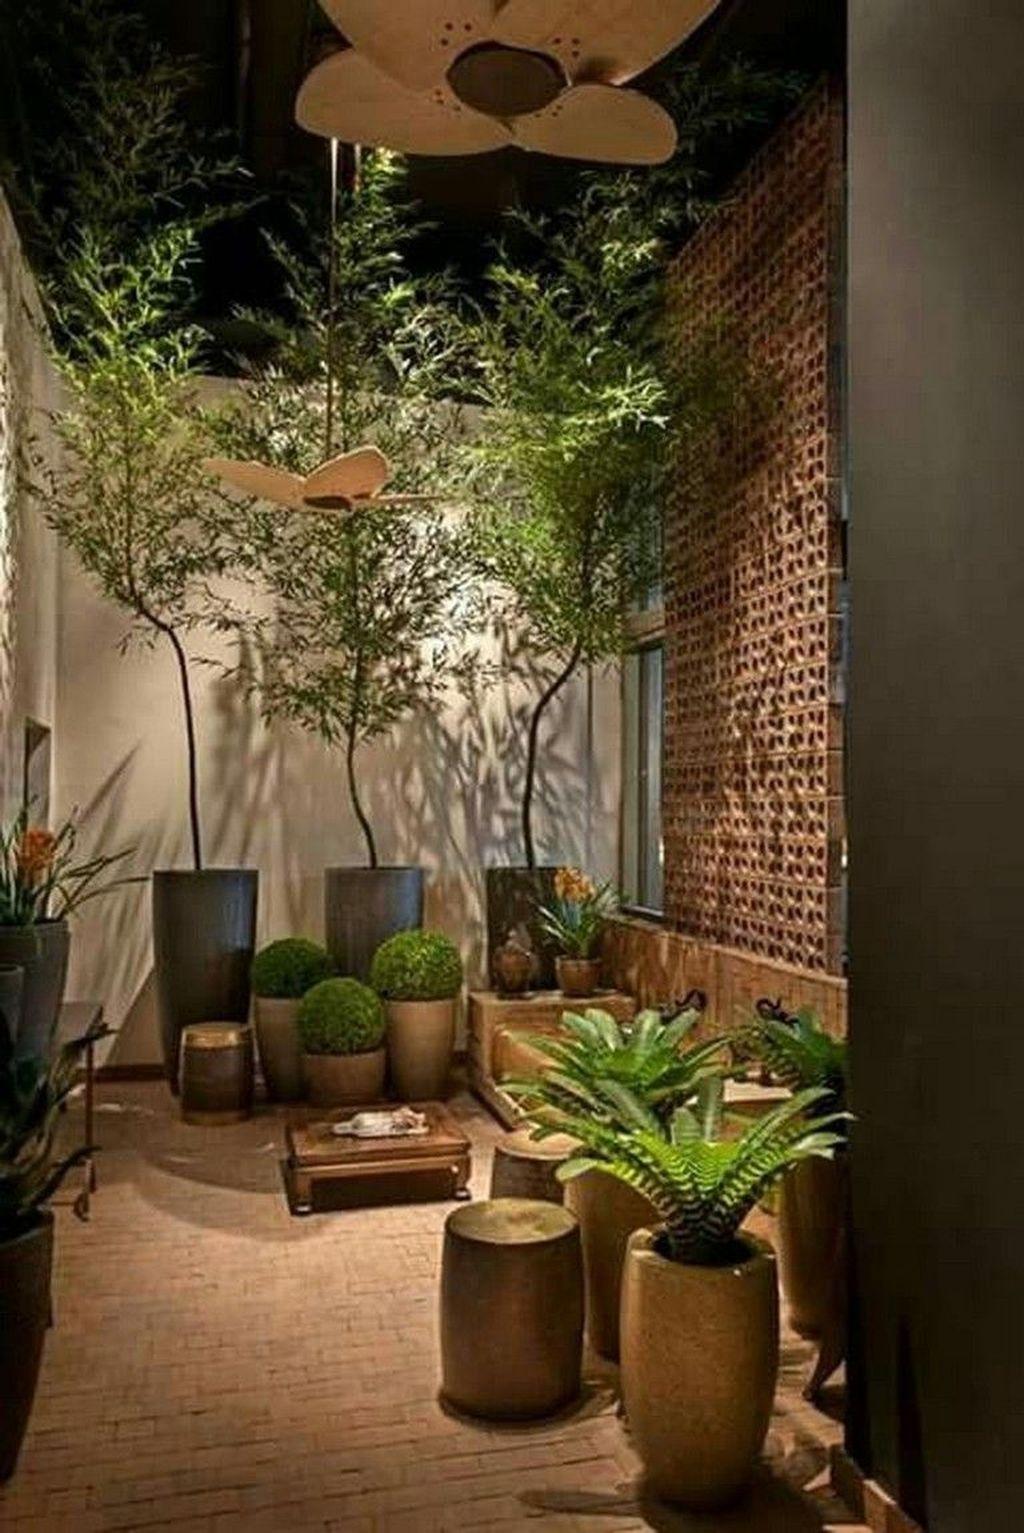 Stunning Small Patio Garden Decorating Ideas 41